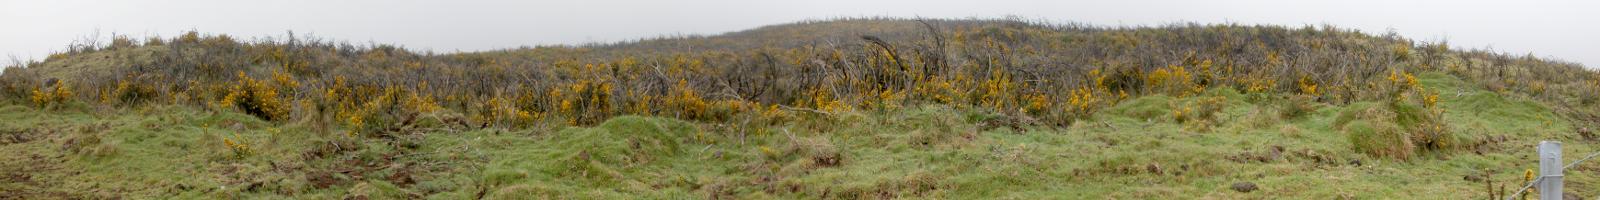 A paddock invaded by gorse in Hawai'i (D.Kriticos, CSIRO)